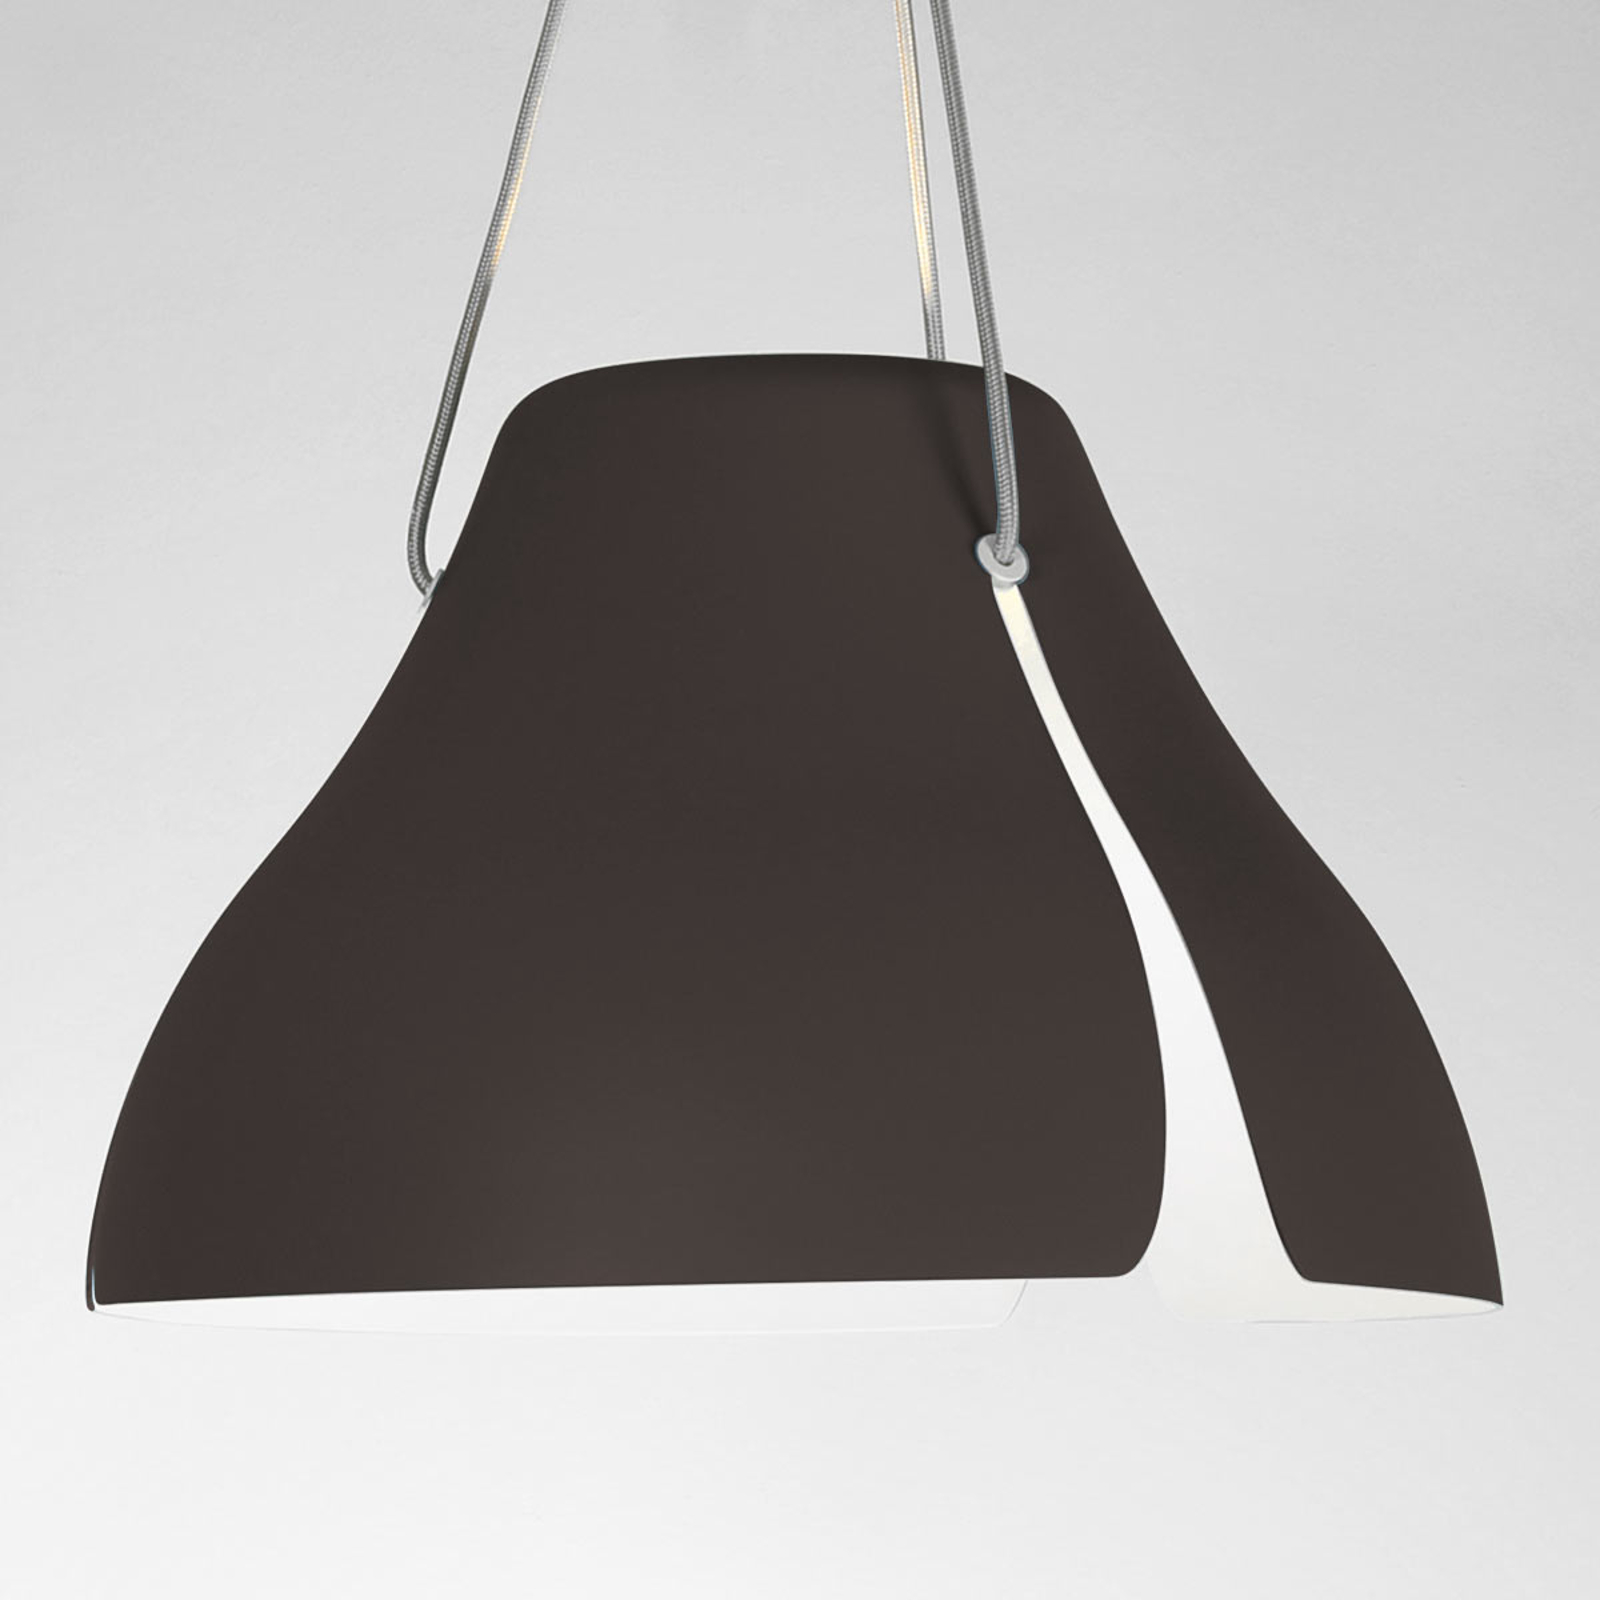 LED-pendellampe Ginkgo S40 40 cm brun